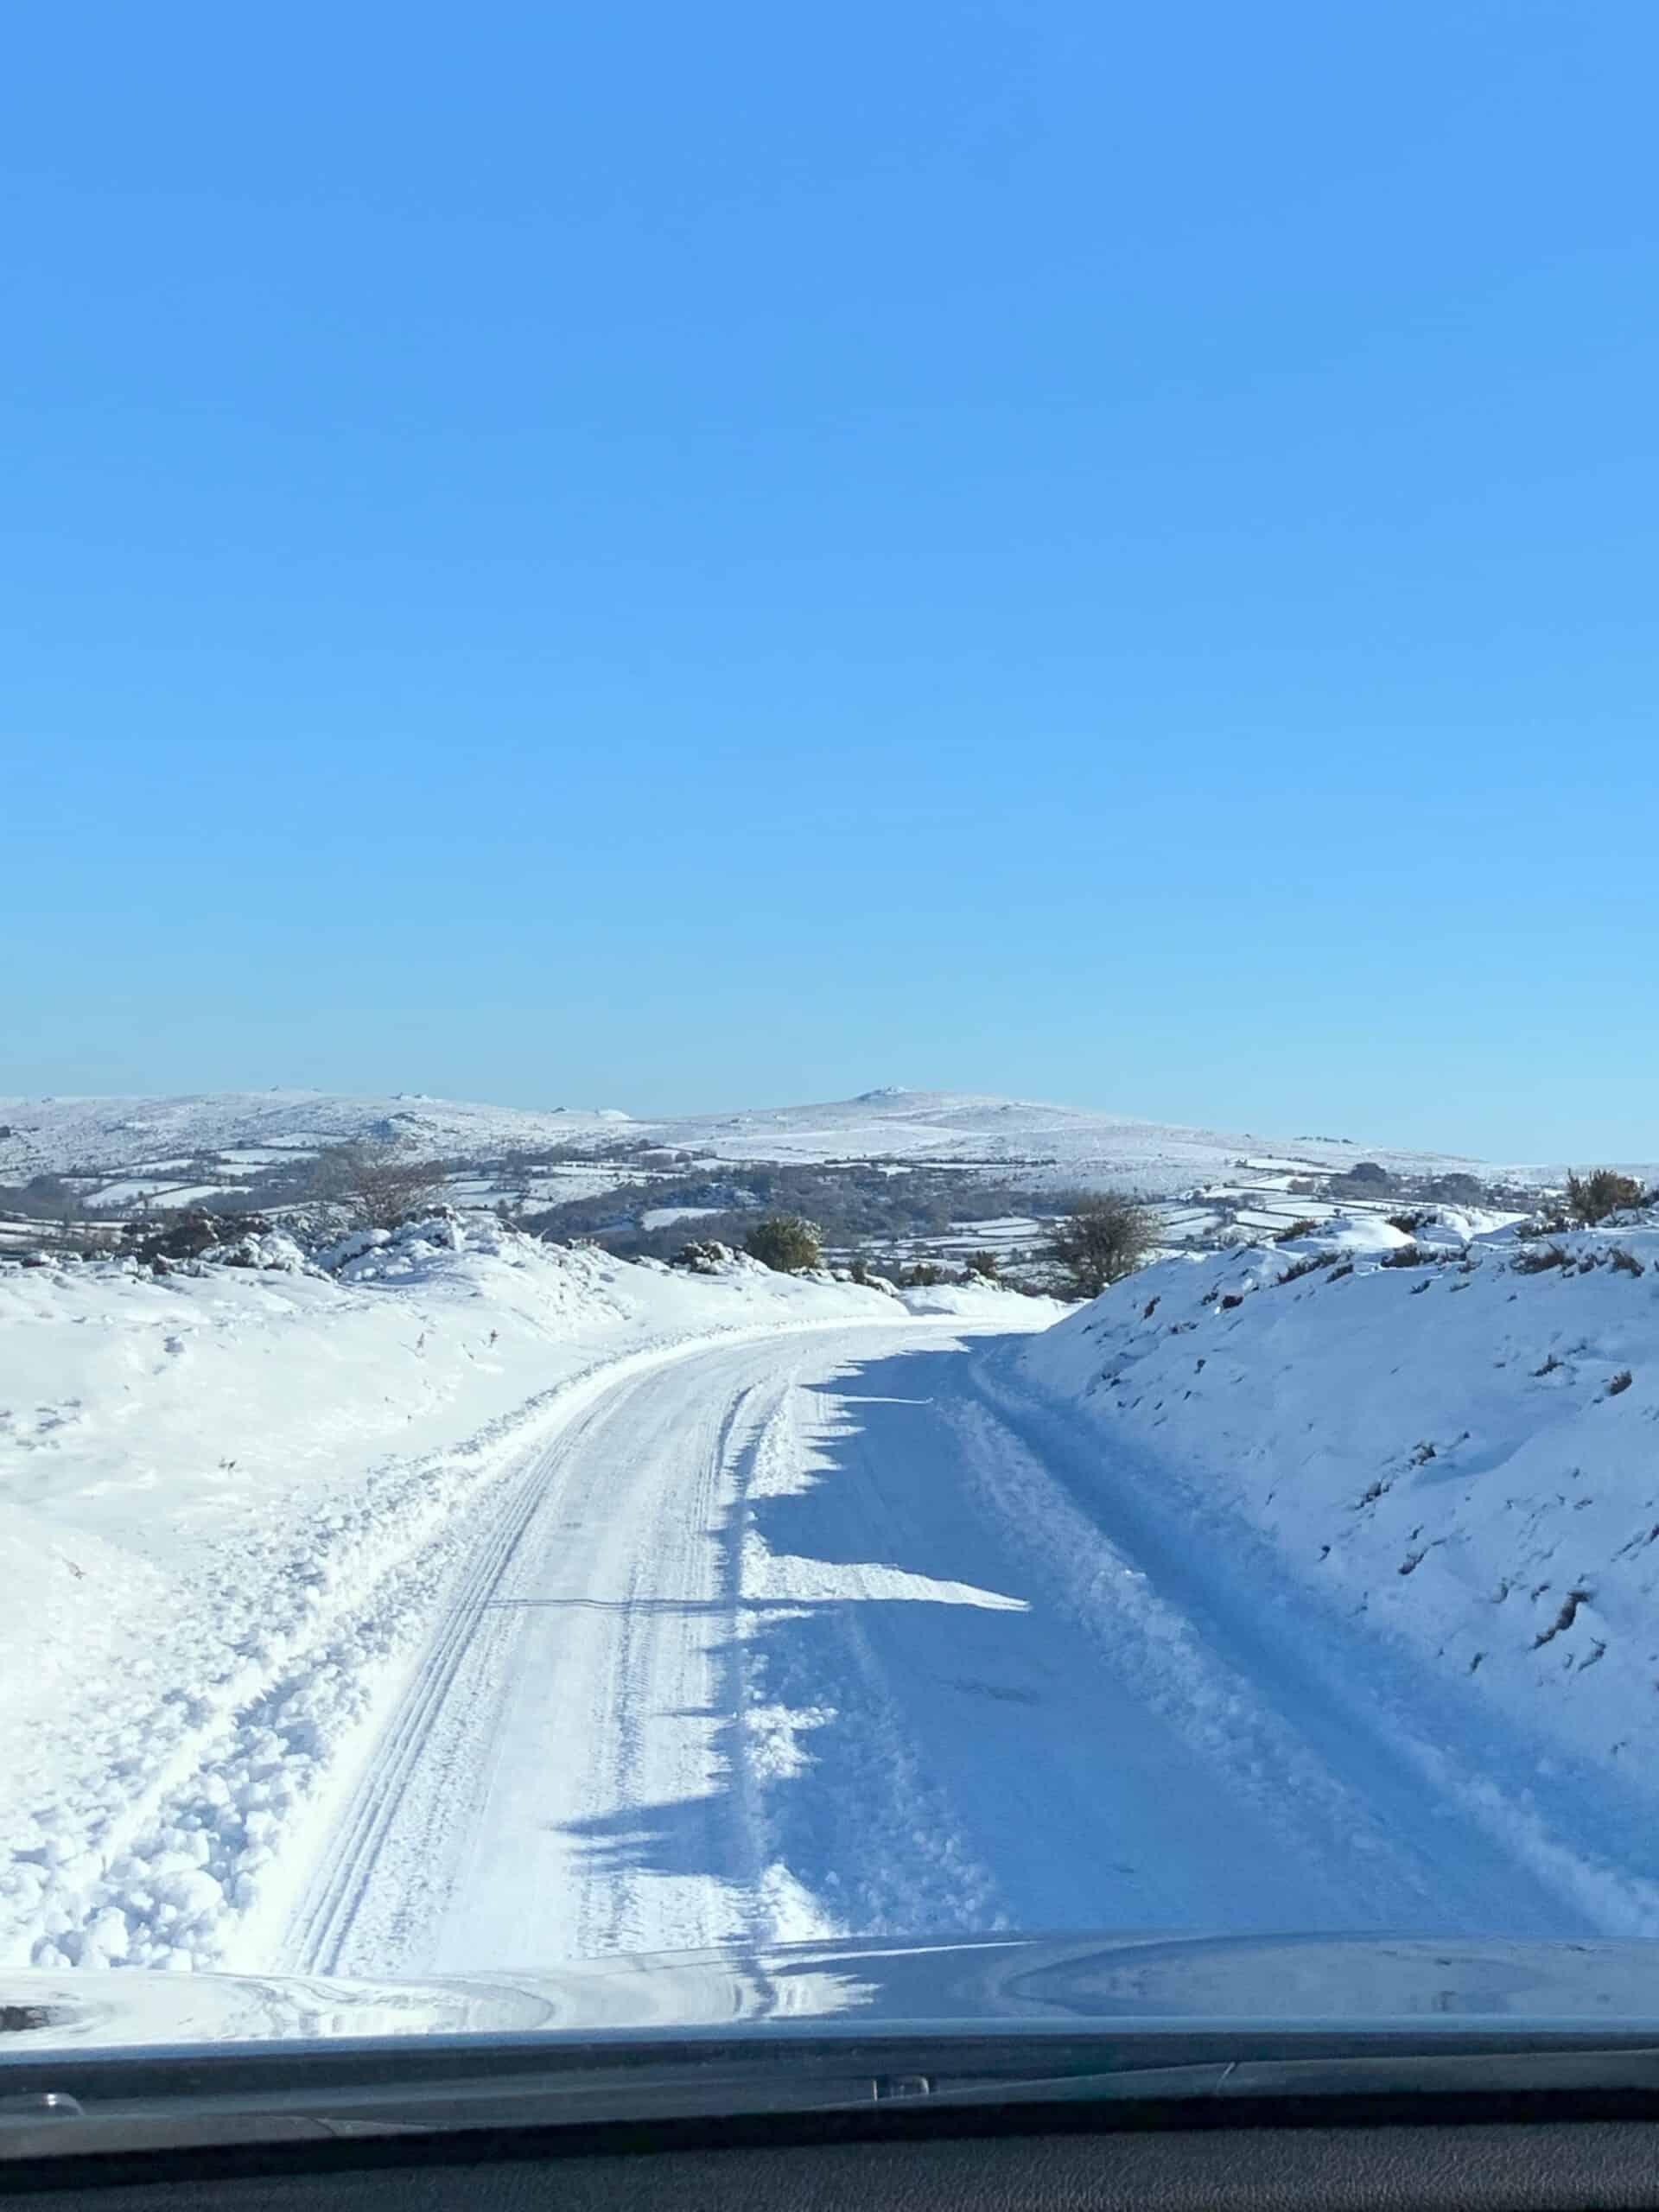 Snowy road on Dartmoor in Devon